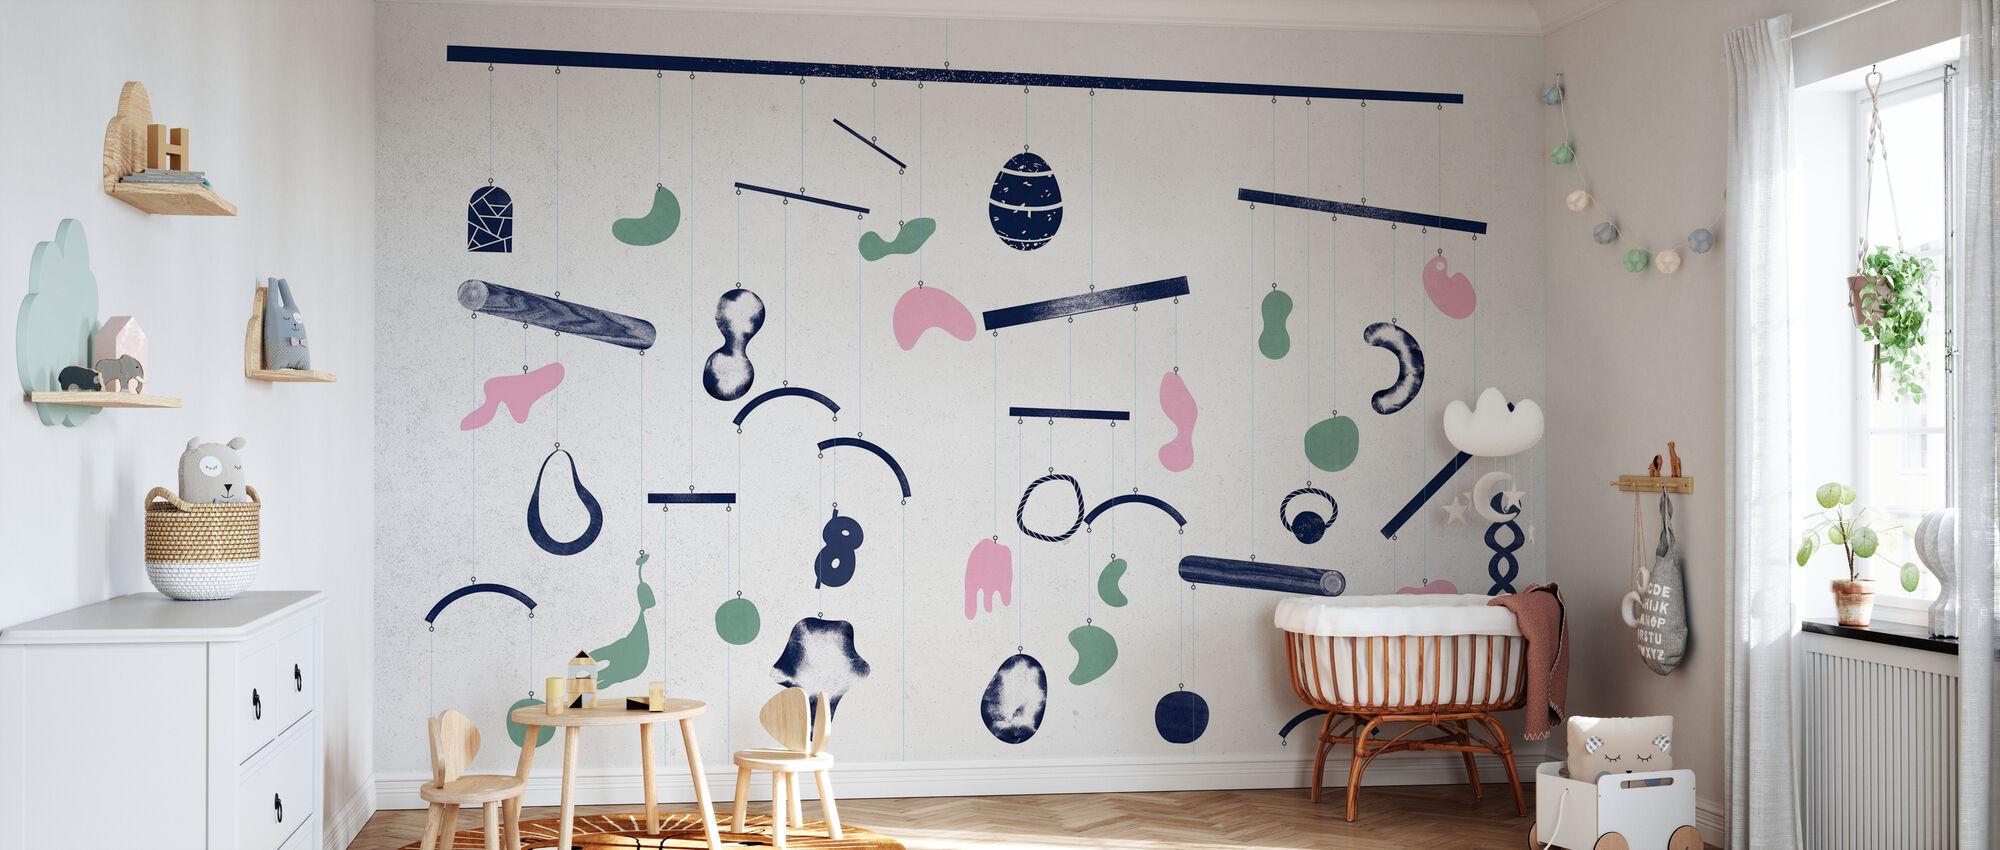 Mobile - Wallpaper - Nursery